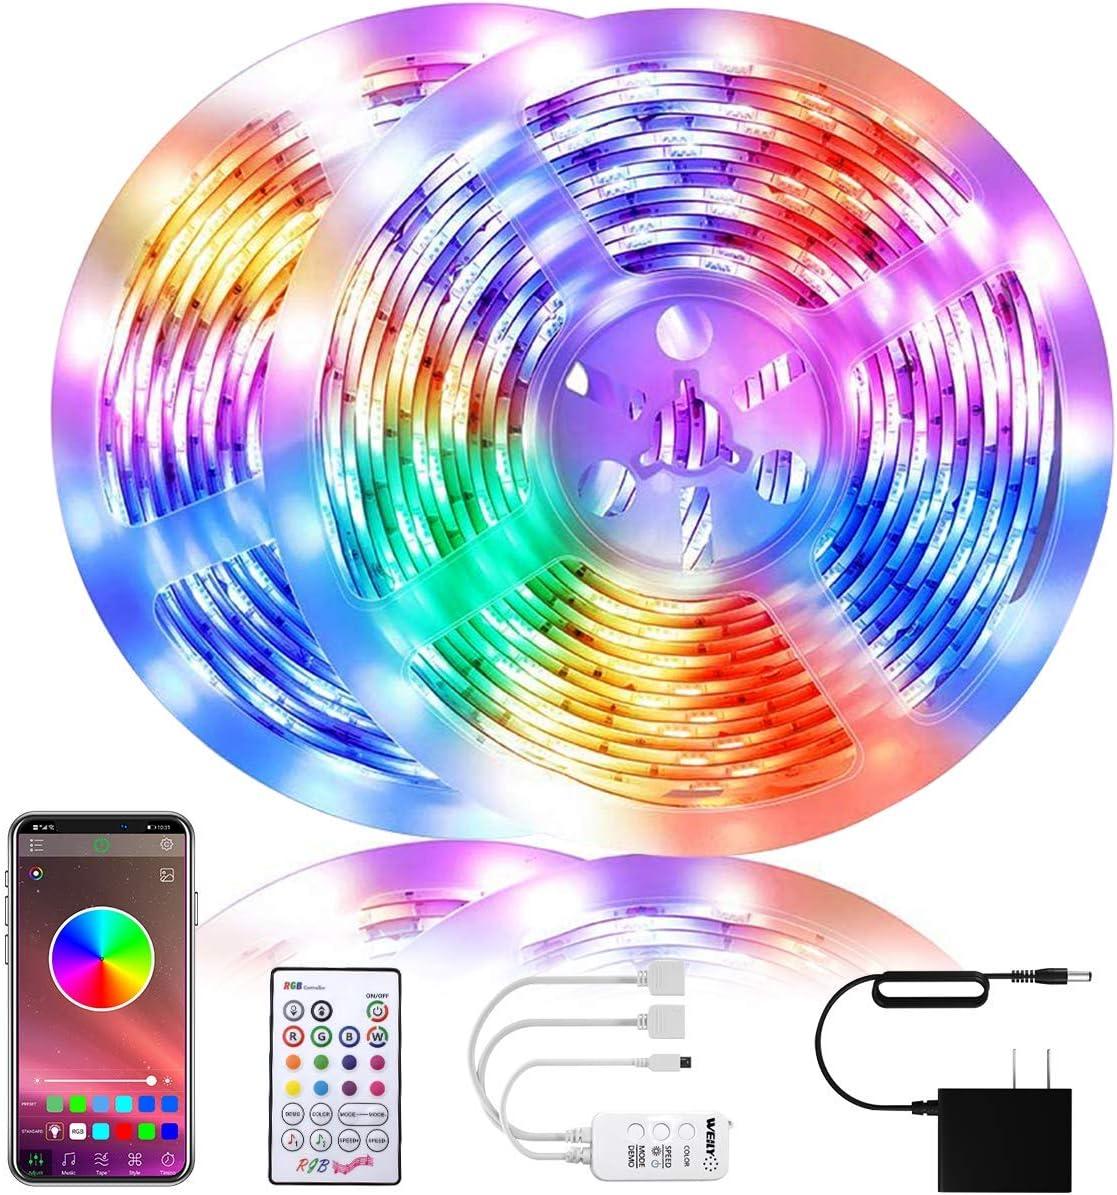 WEILY LED Strip Lights 32.8ft, Bluetooth RGB Color Changing LED Lights for Home, Kitchen, Room, Bedroom, Dorm Room, Bar, with IR Remote Control,300 5050 LEDs, DIY Mode